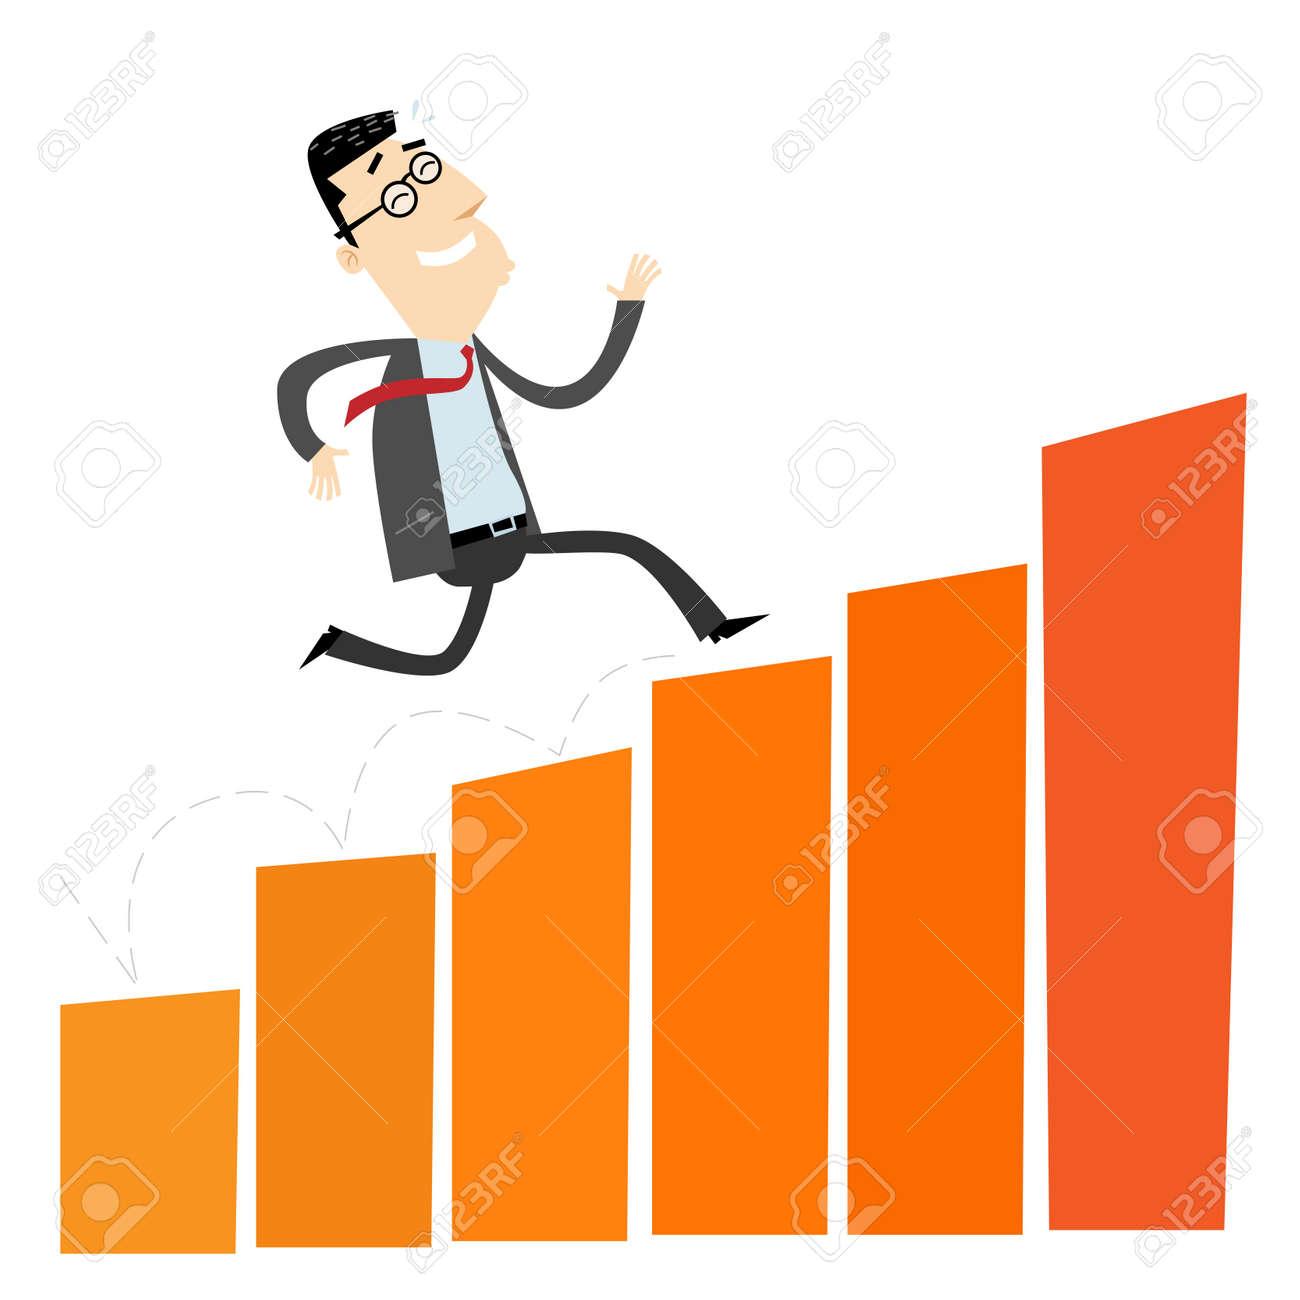 Climbing Businessman Stock Vector - 19707003